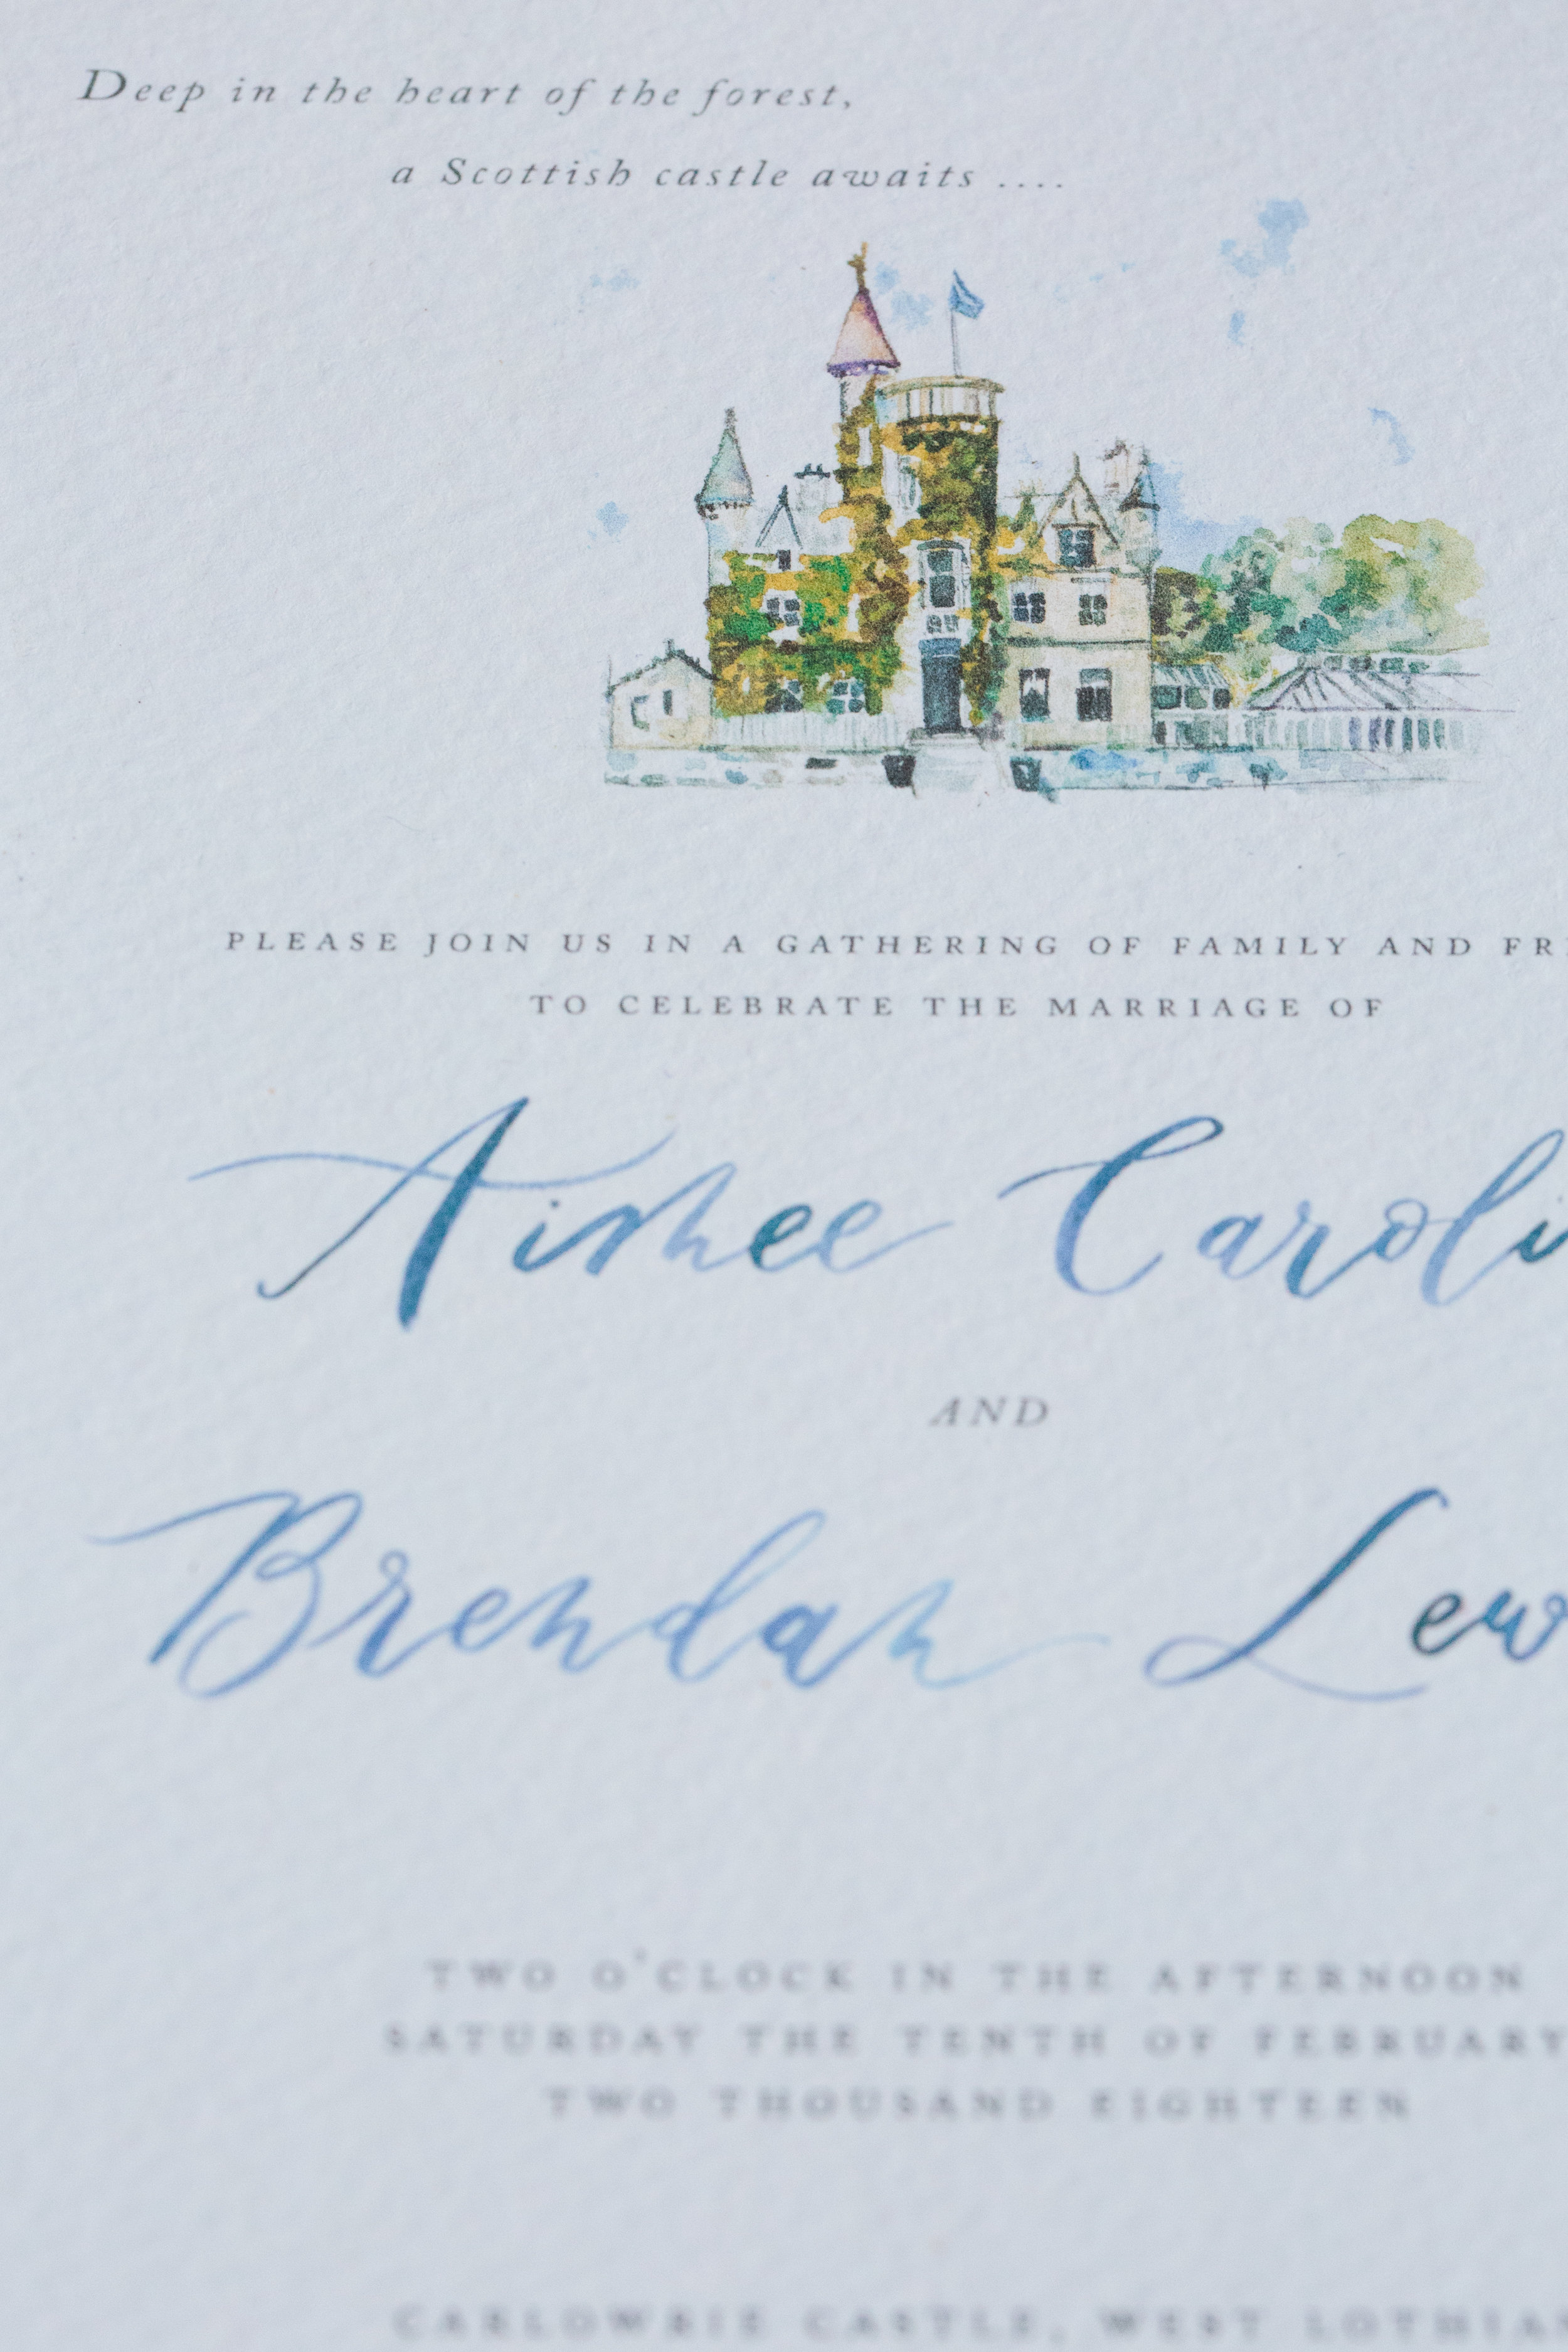 castle invite 2-1.jpg